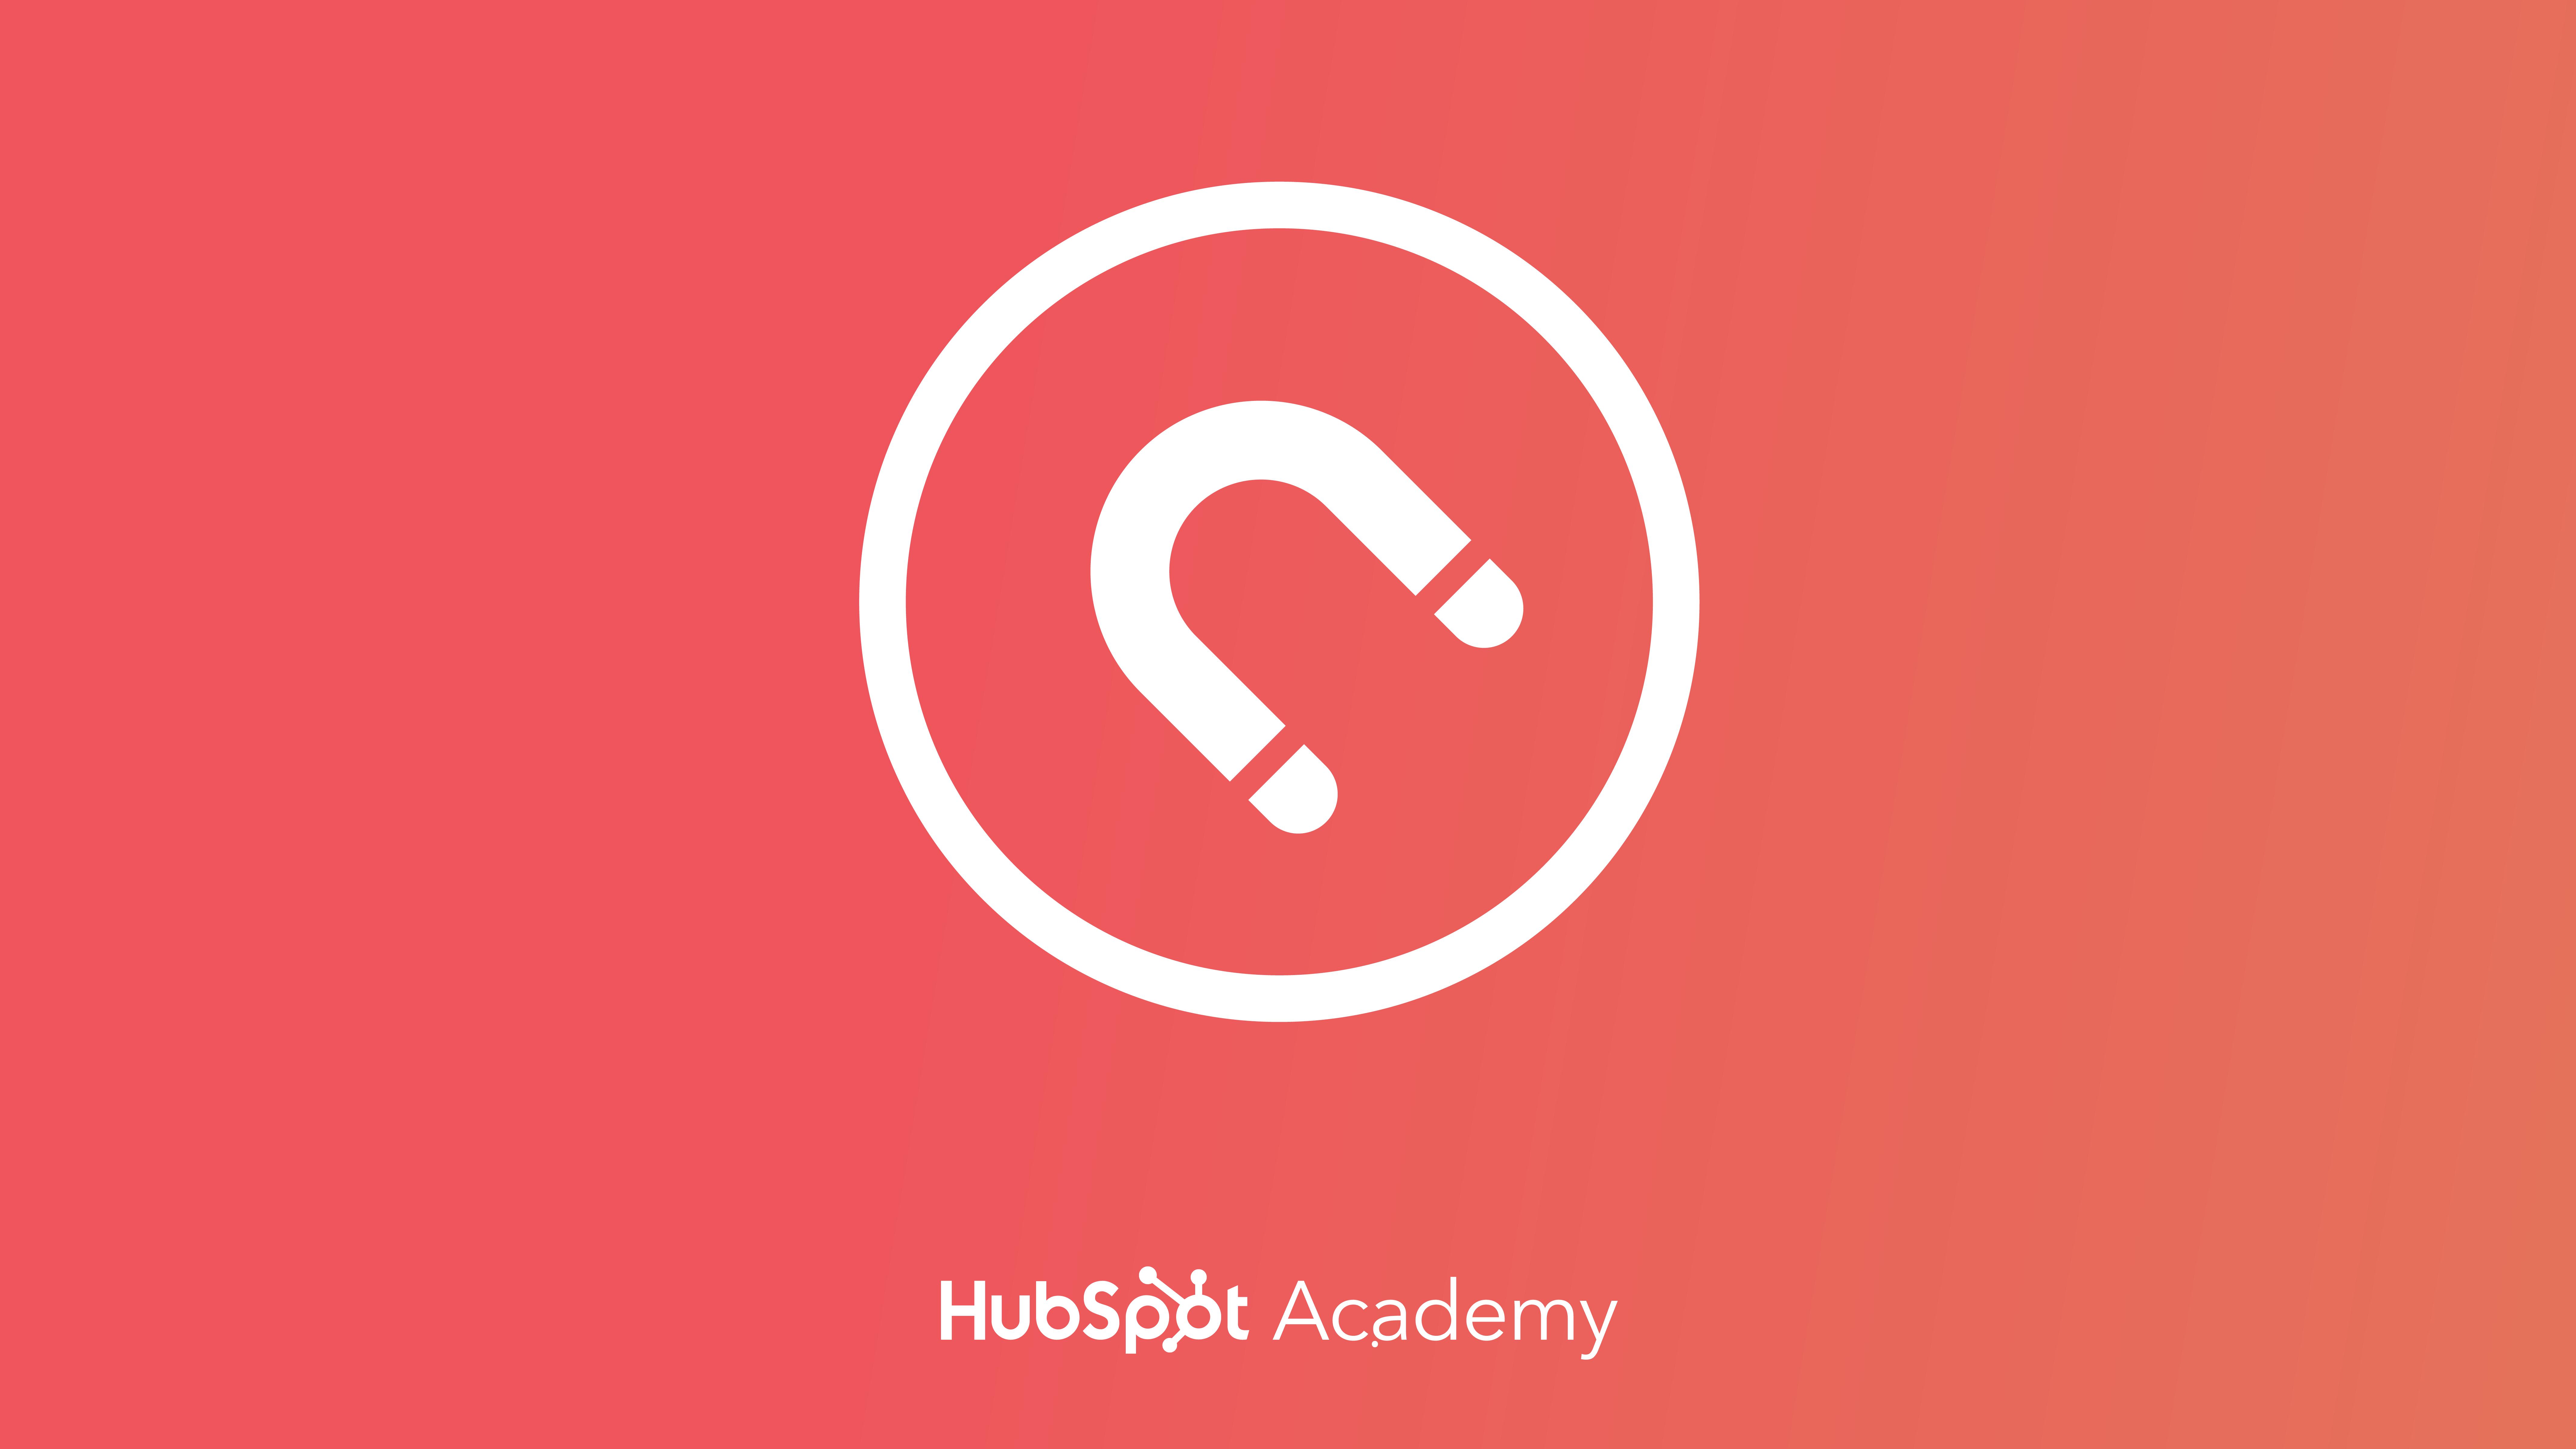 Inbound Marketing Certification course by HubSpot Academy